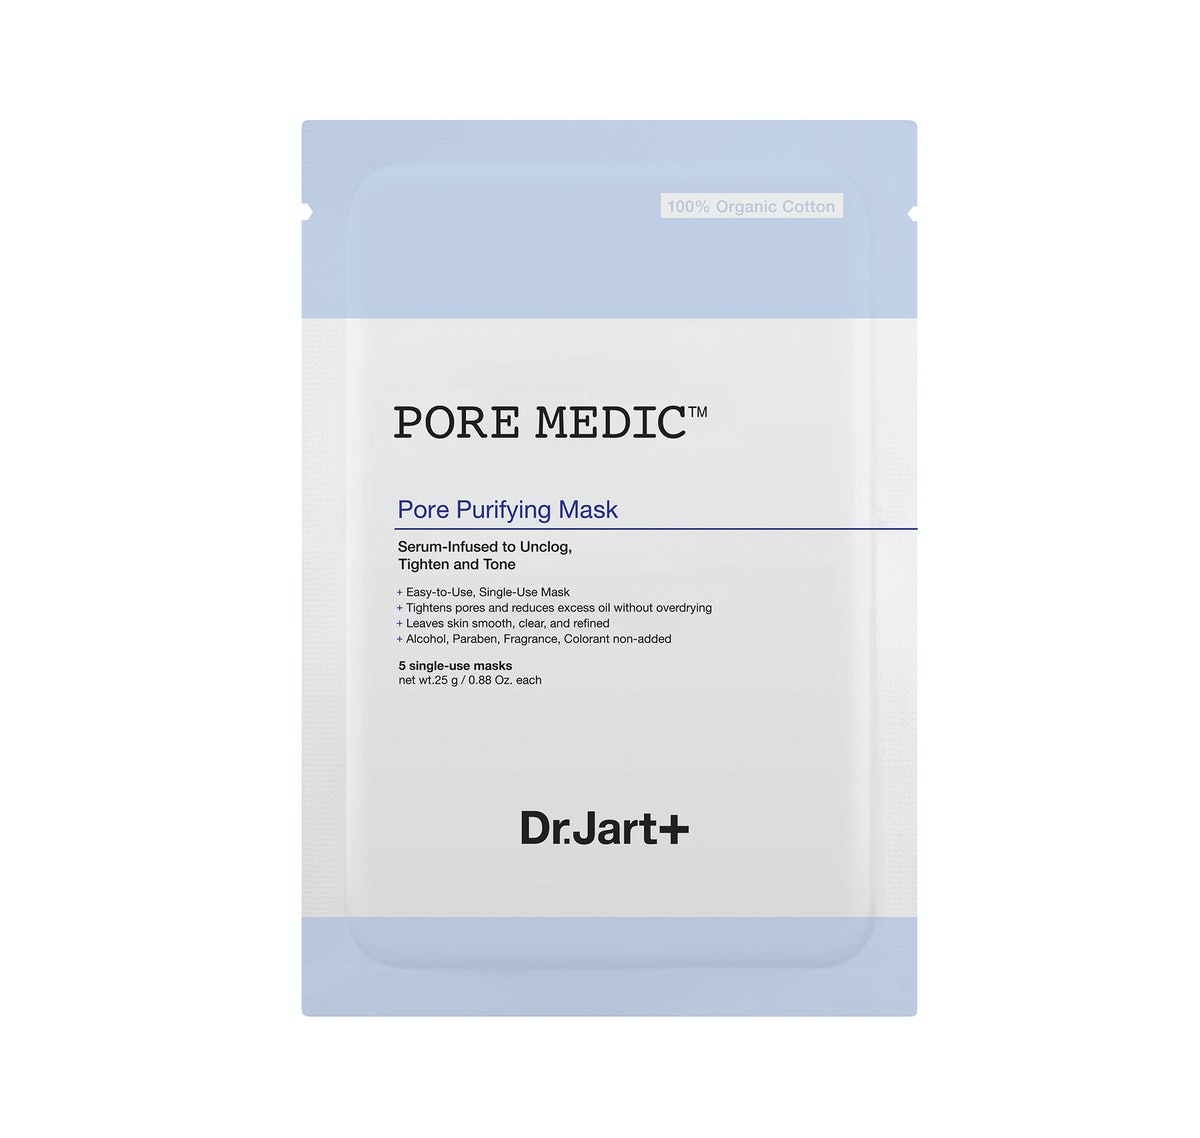 Dr. Jart+ PORE MEDIC Purifying Mask